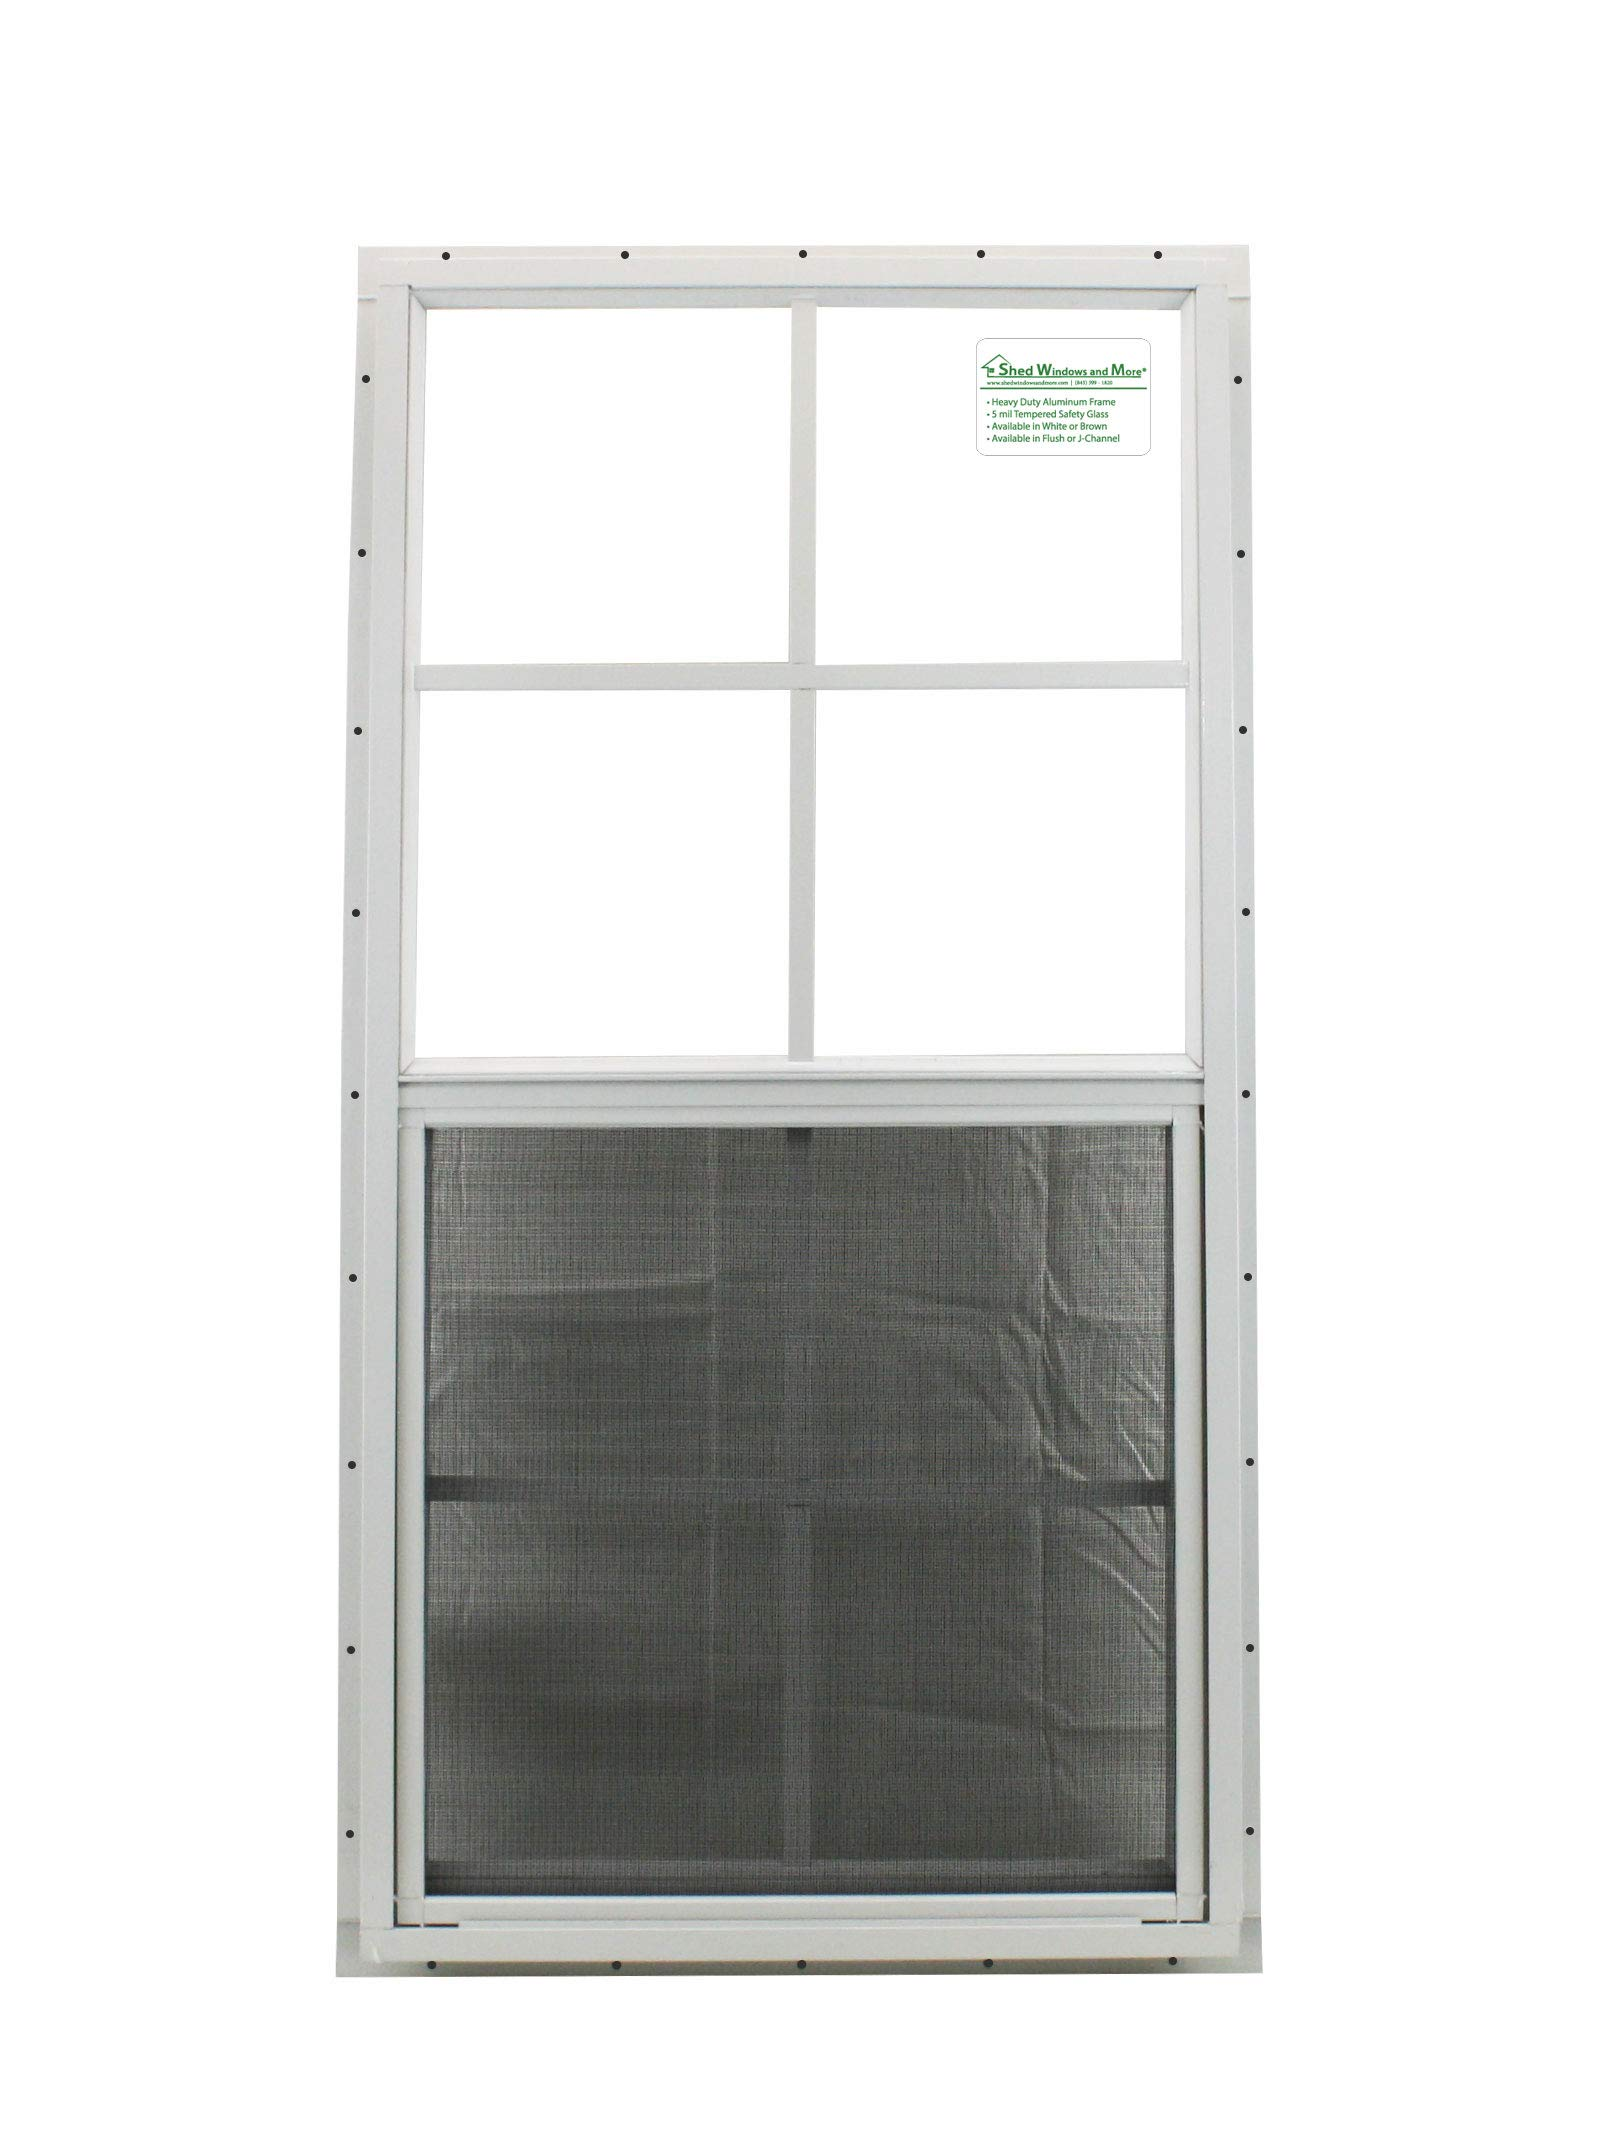 Shed Windows 18'' X 36'' White J-Channel Mount, SAFTY Glass Playhouse Windows, Chicken Coop Windows